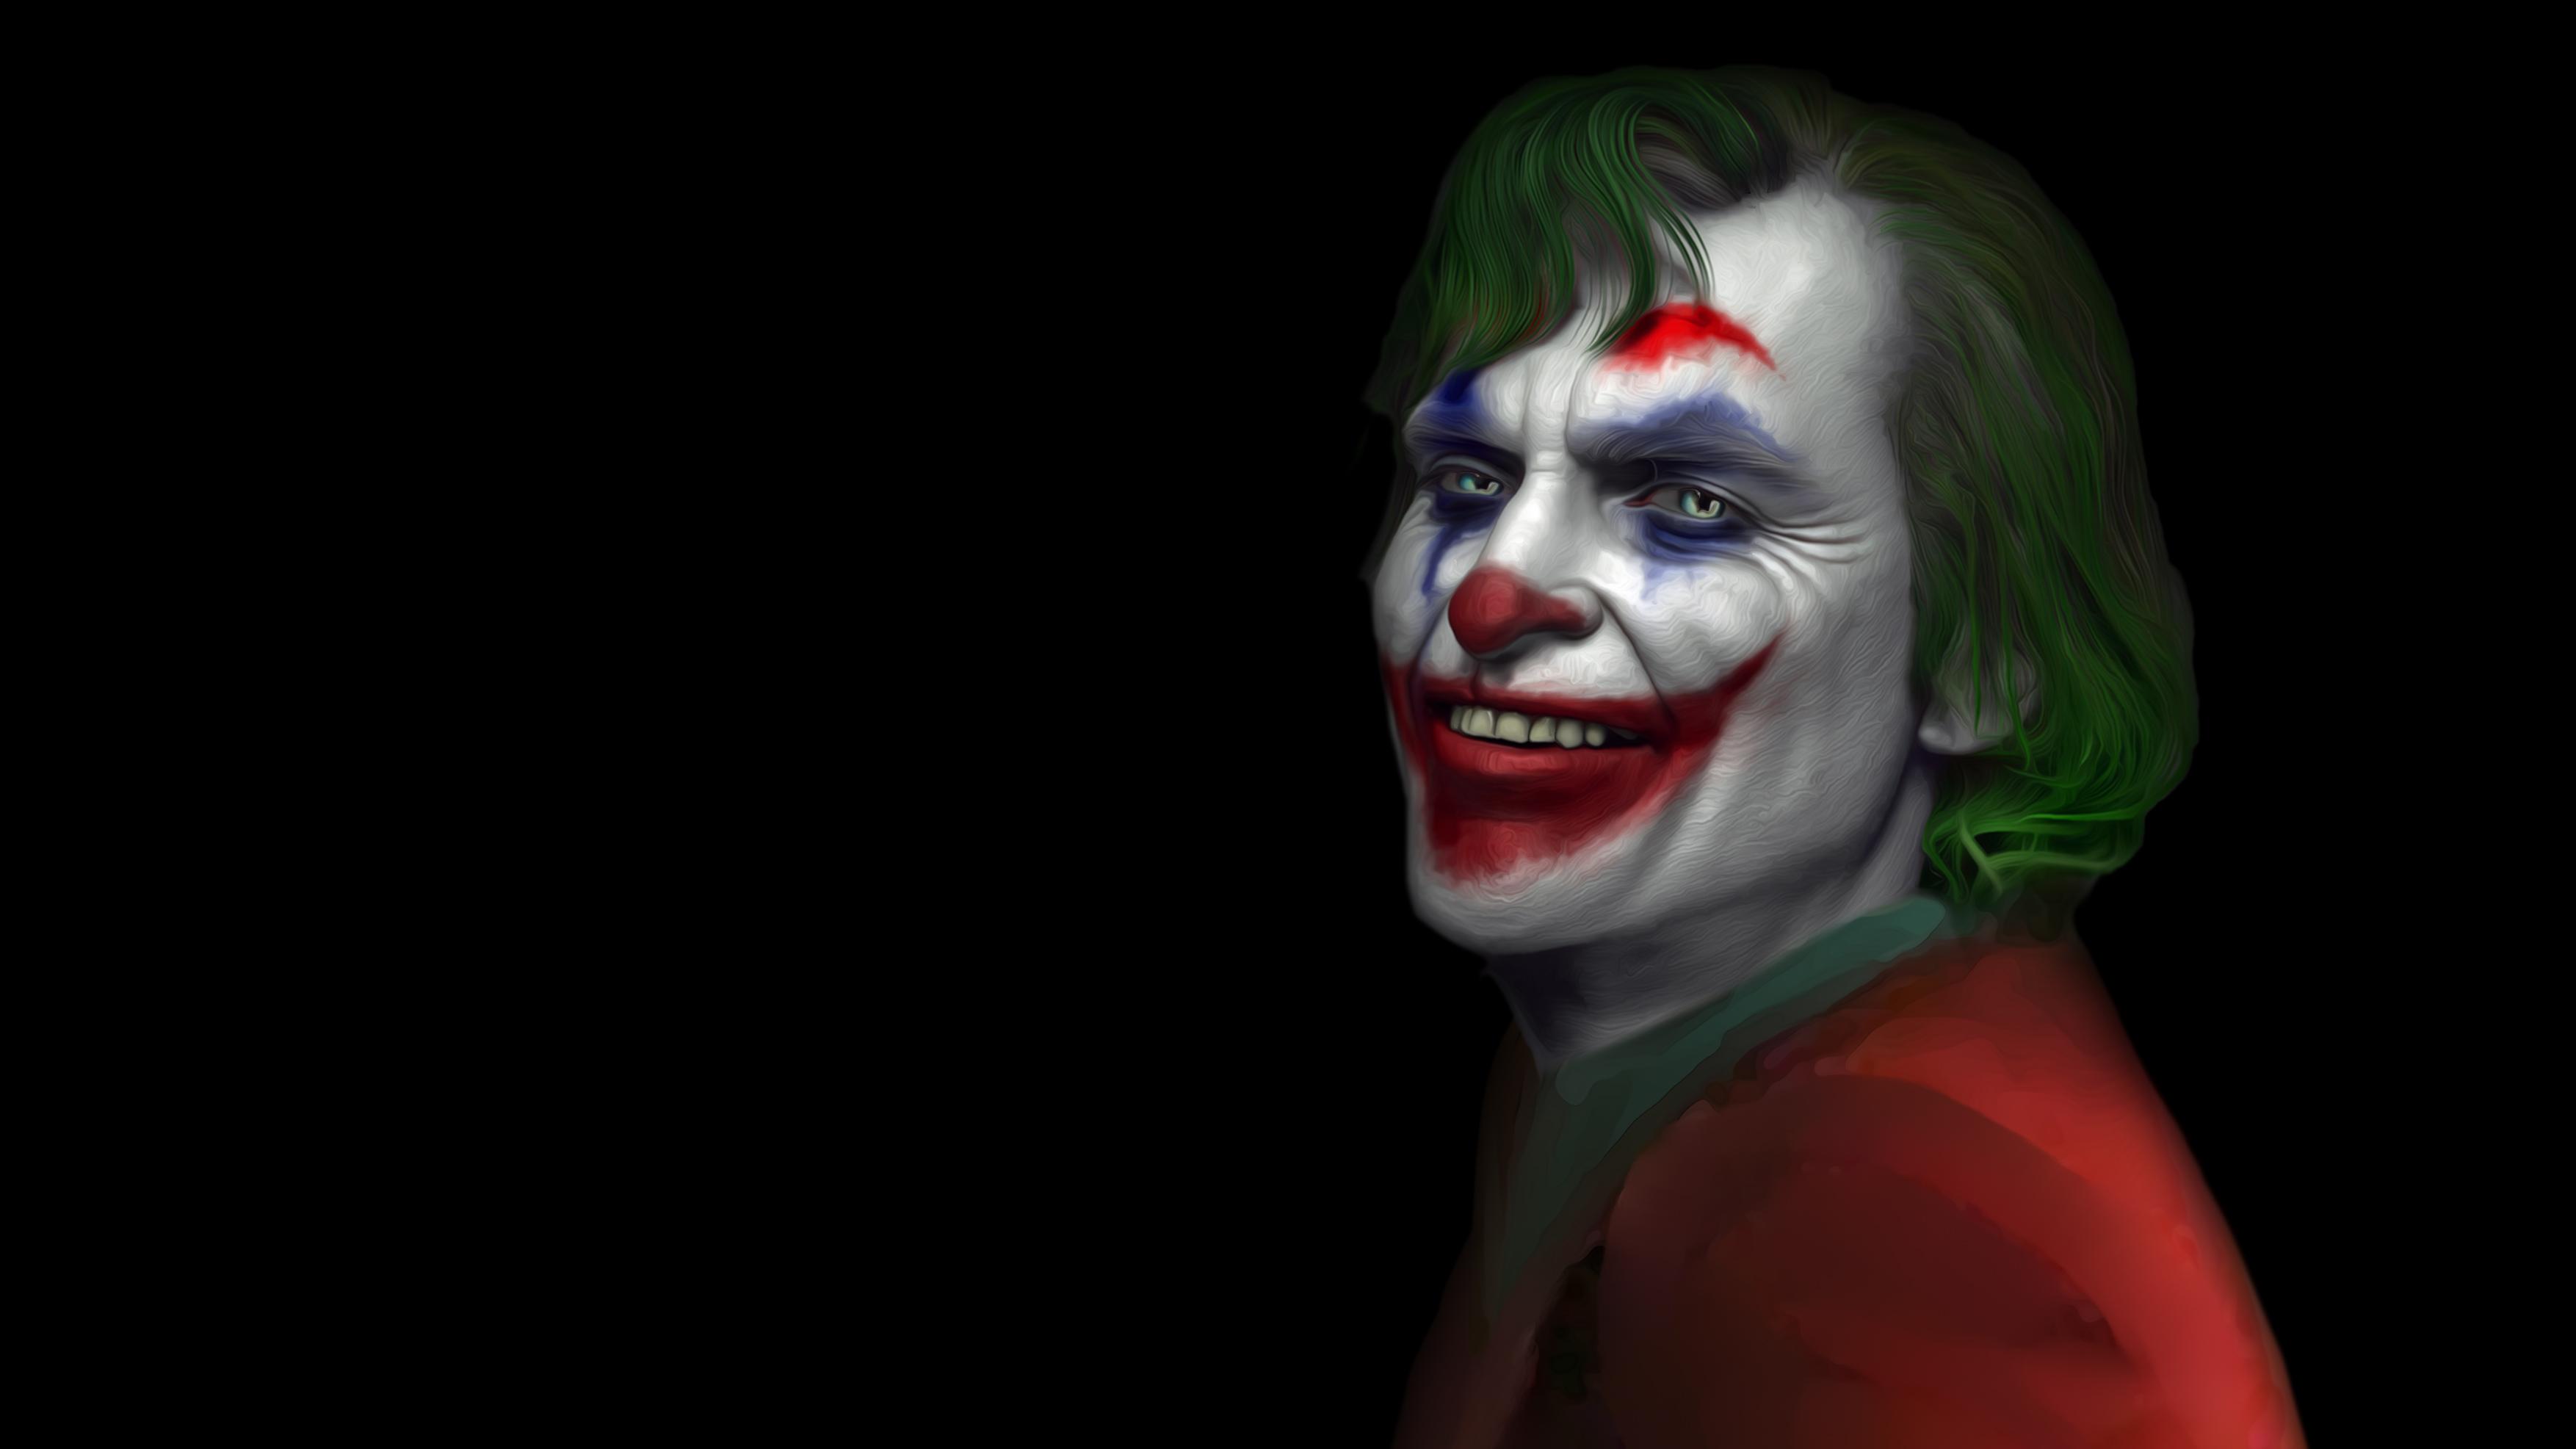 Joker Movie Joaquin Phoenix 2019, HD Superheroes, 4k ...